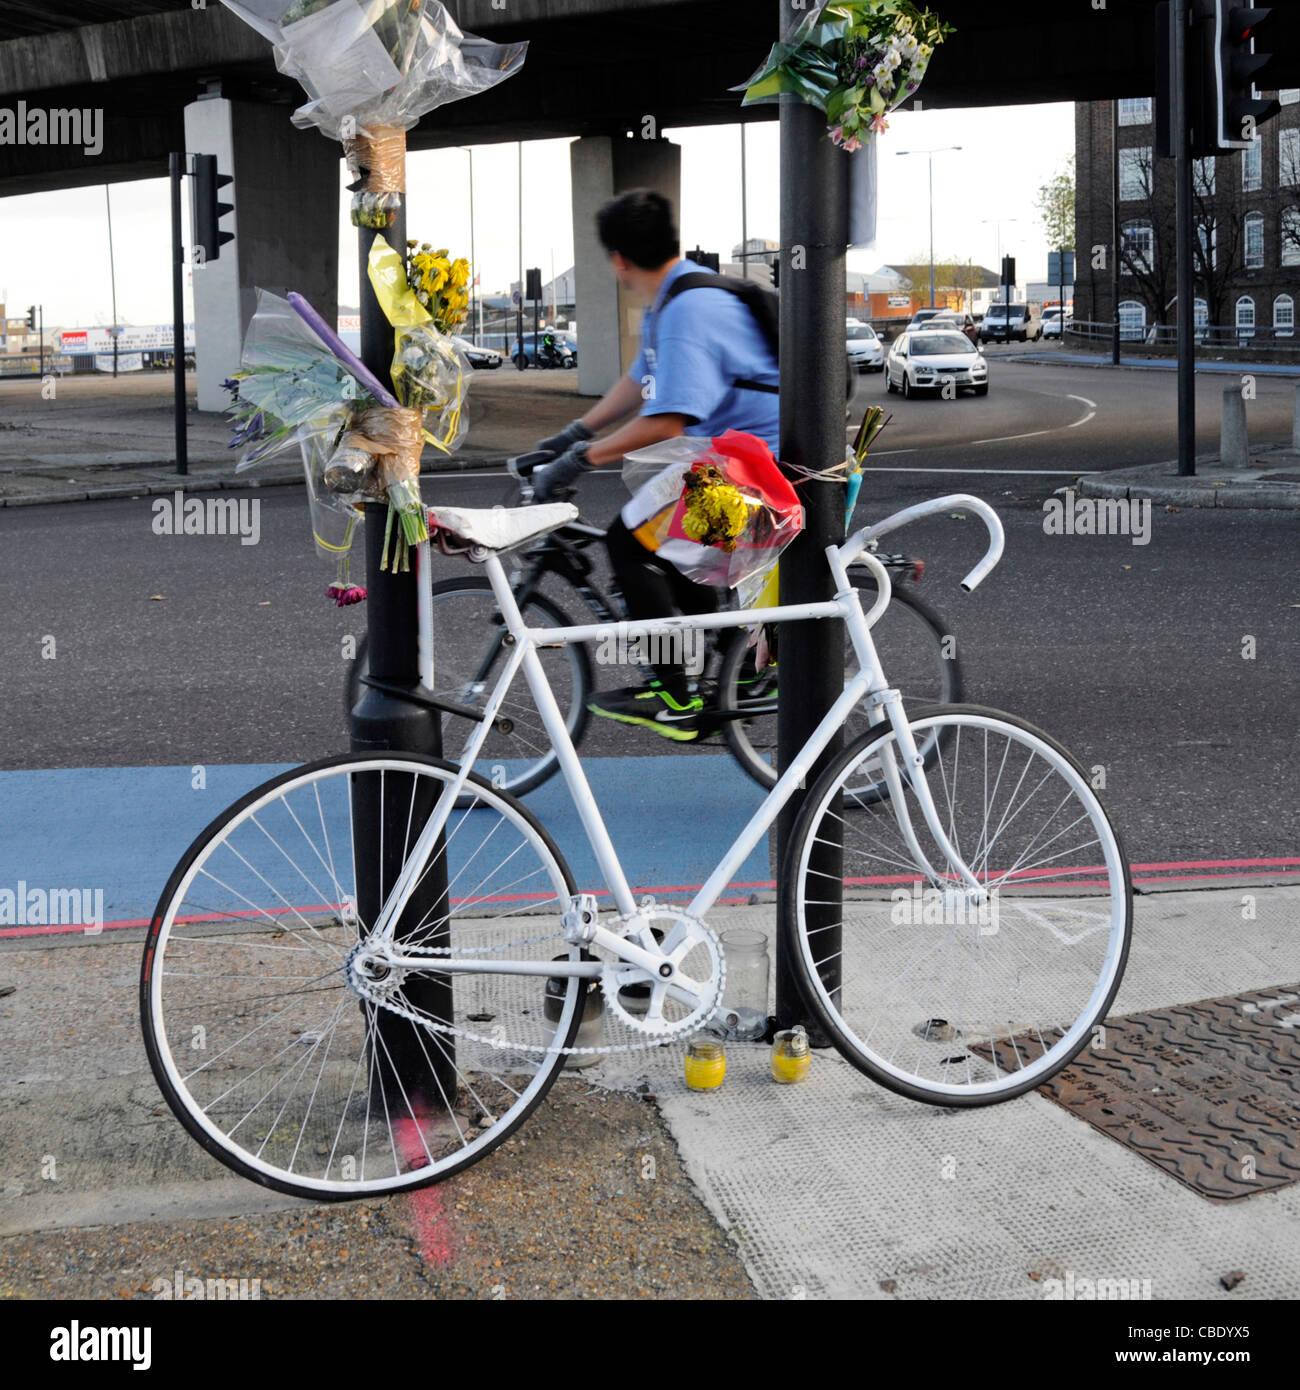 cyclist accident stockfotos cyclist accident bilder alamy. Black Bedroom Furniture Sets. Home Design Ideas